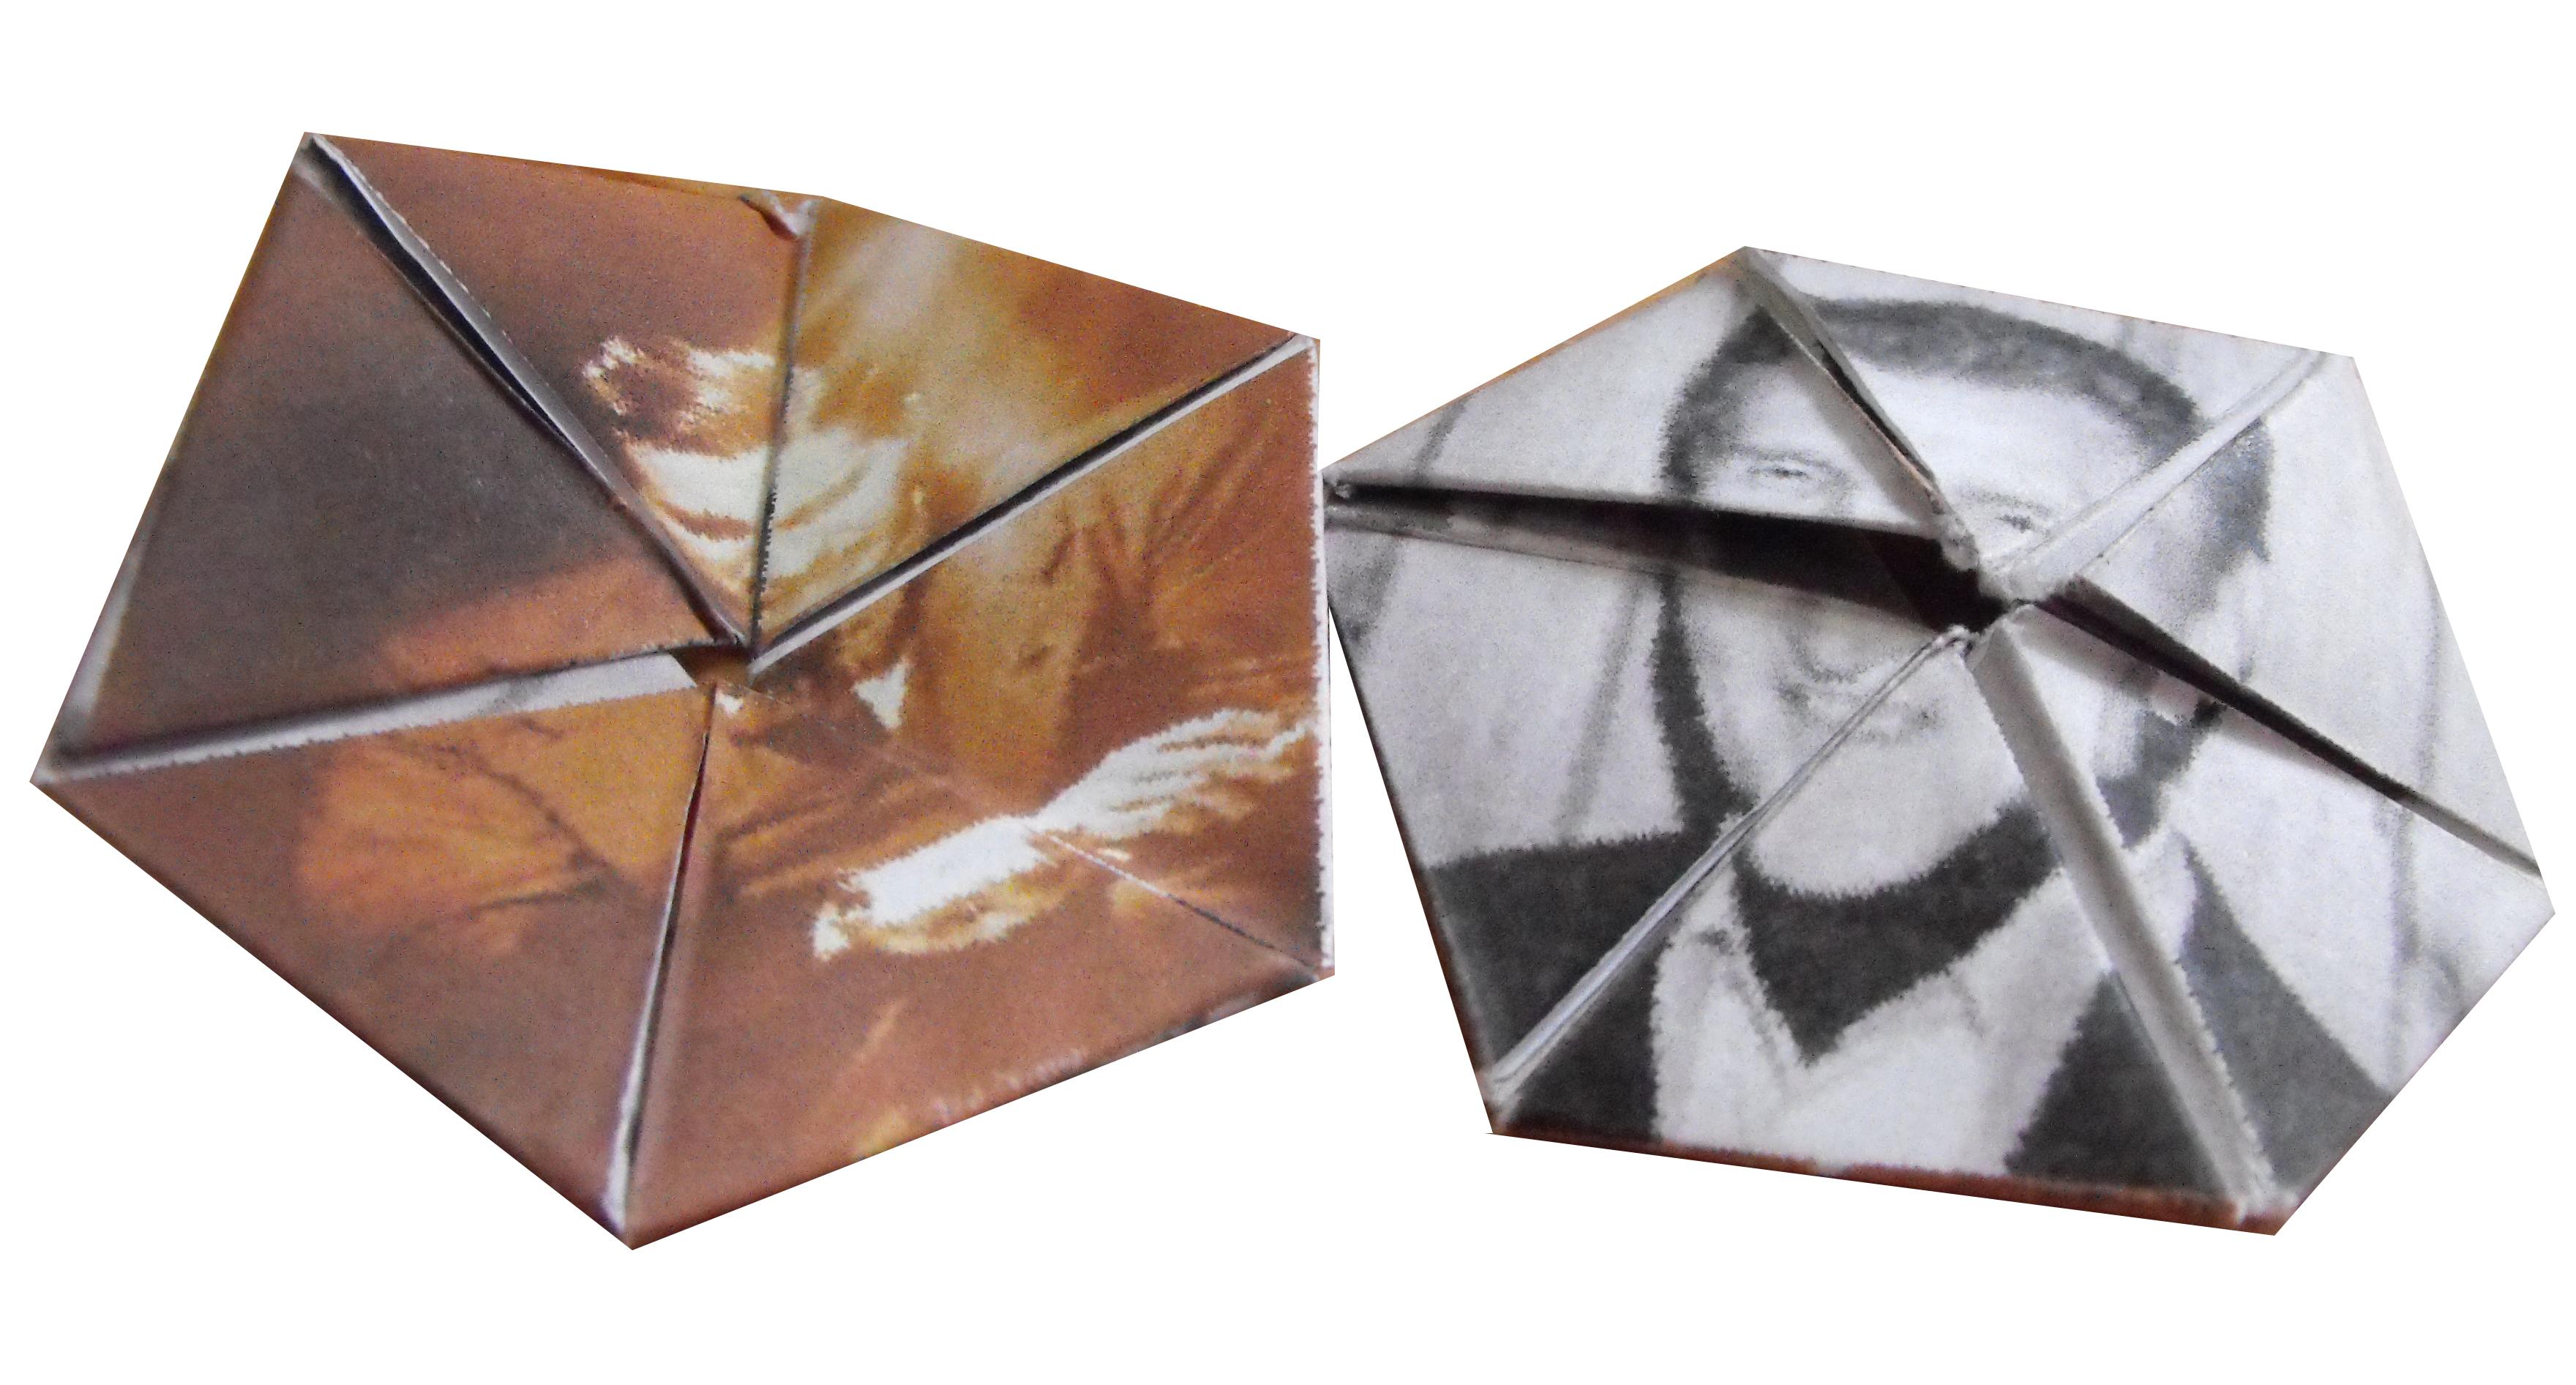 A Magical Hexaflexagon – Hexaflexagon Template